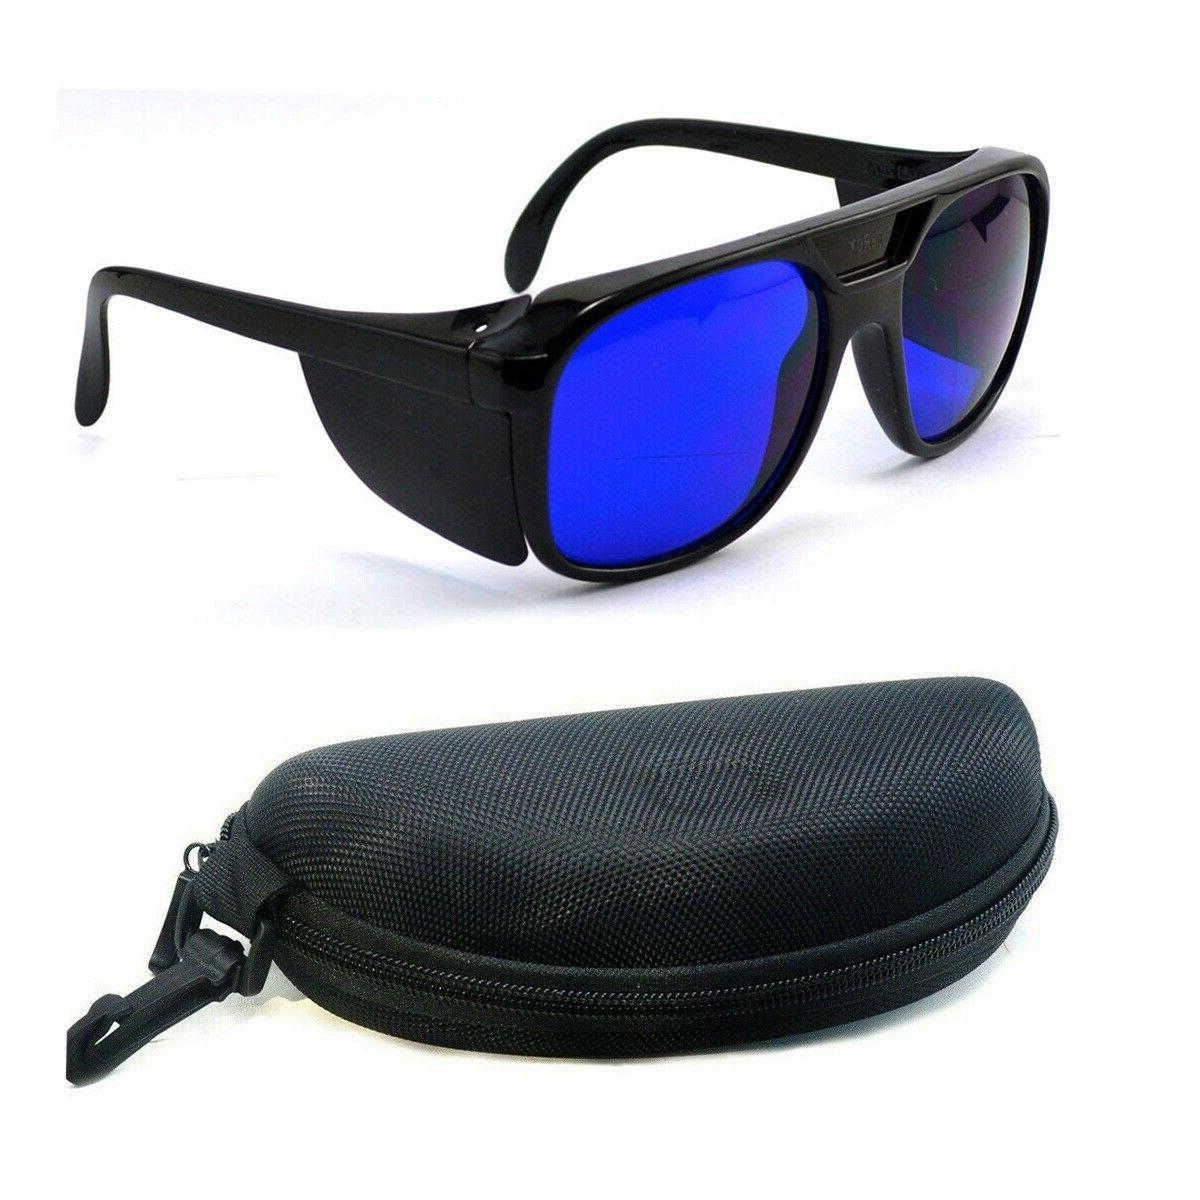 ce od5 ipl laser safety glasses